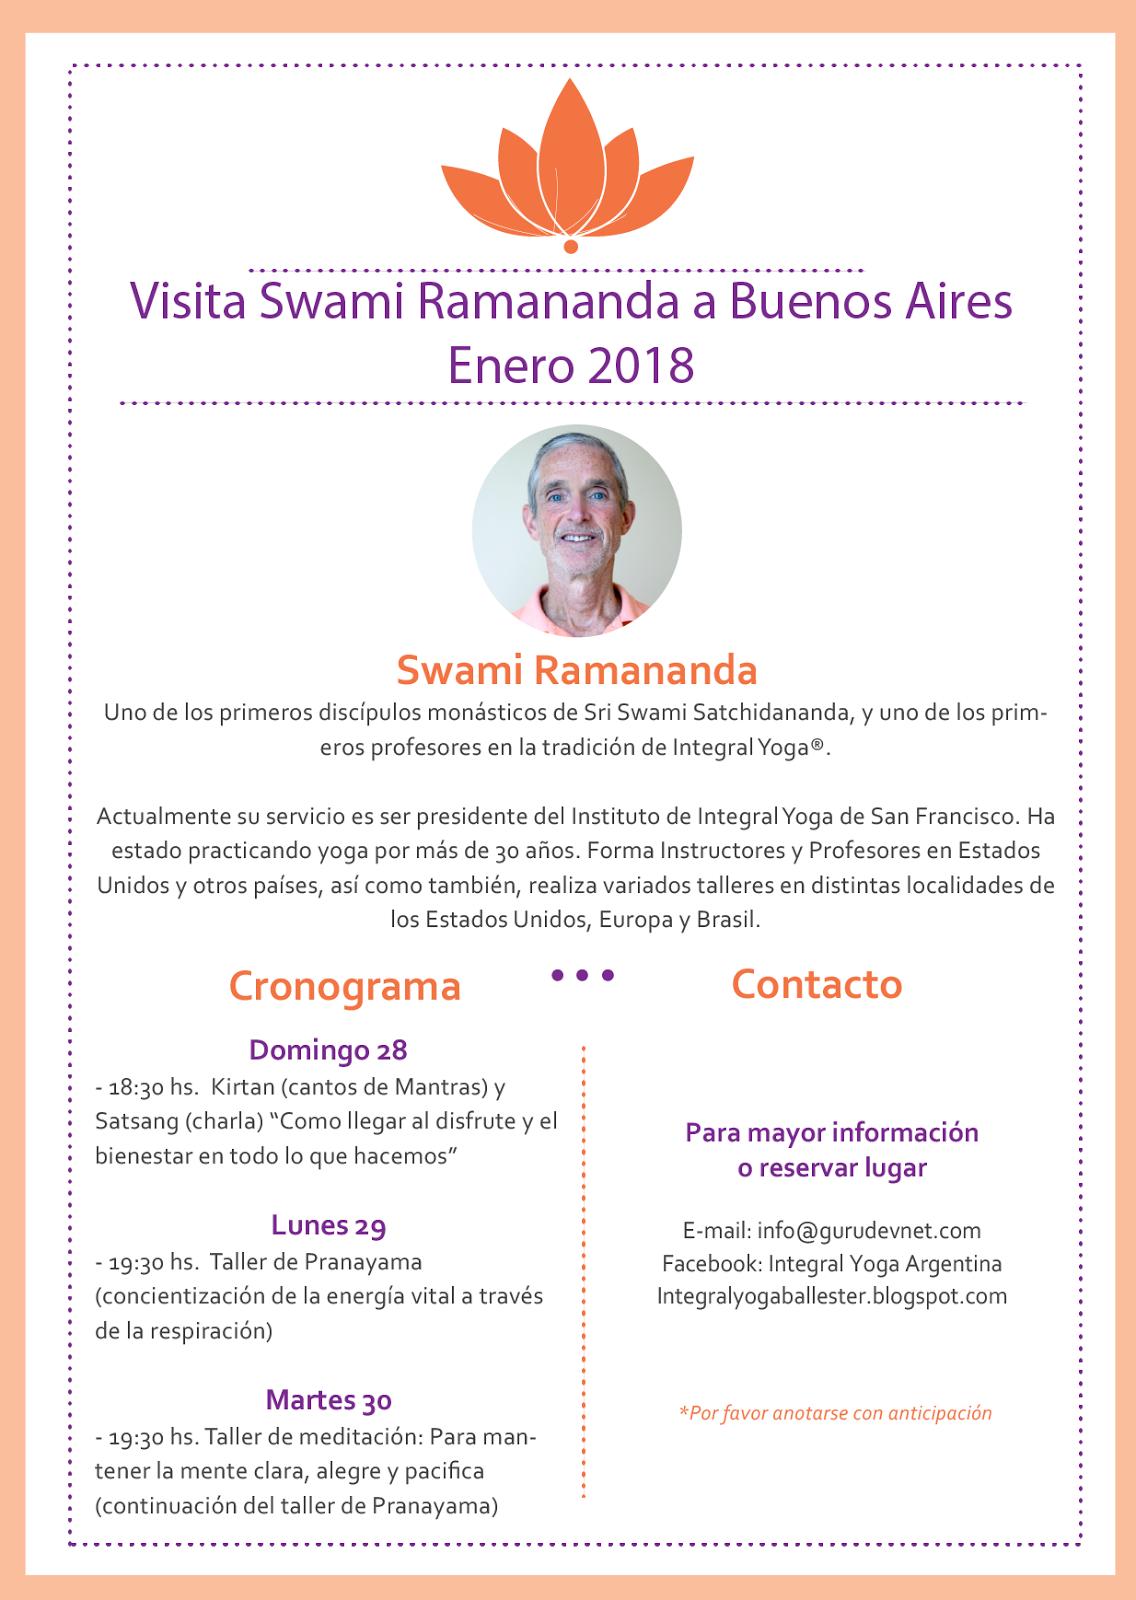 Visita Swami Ramananda